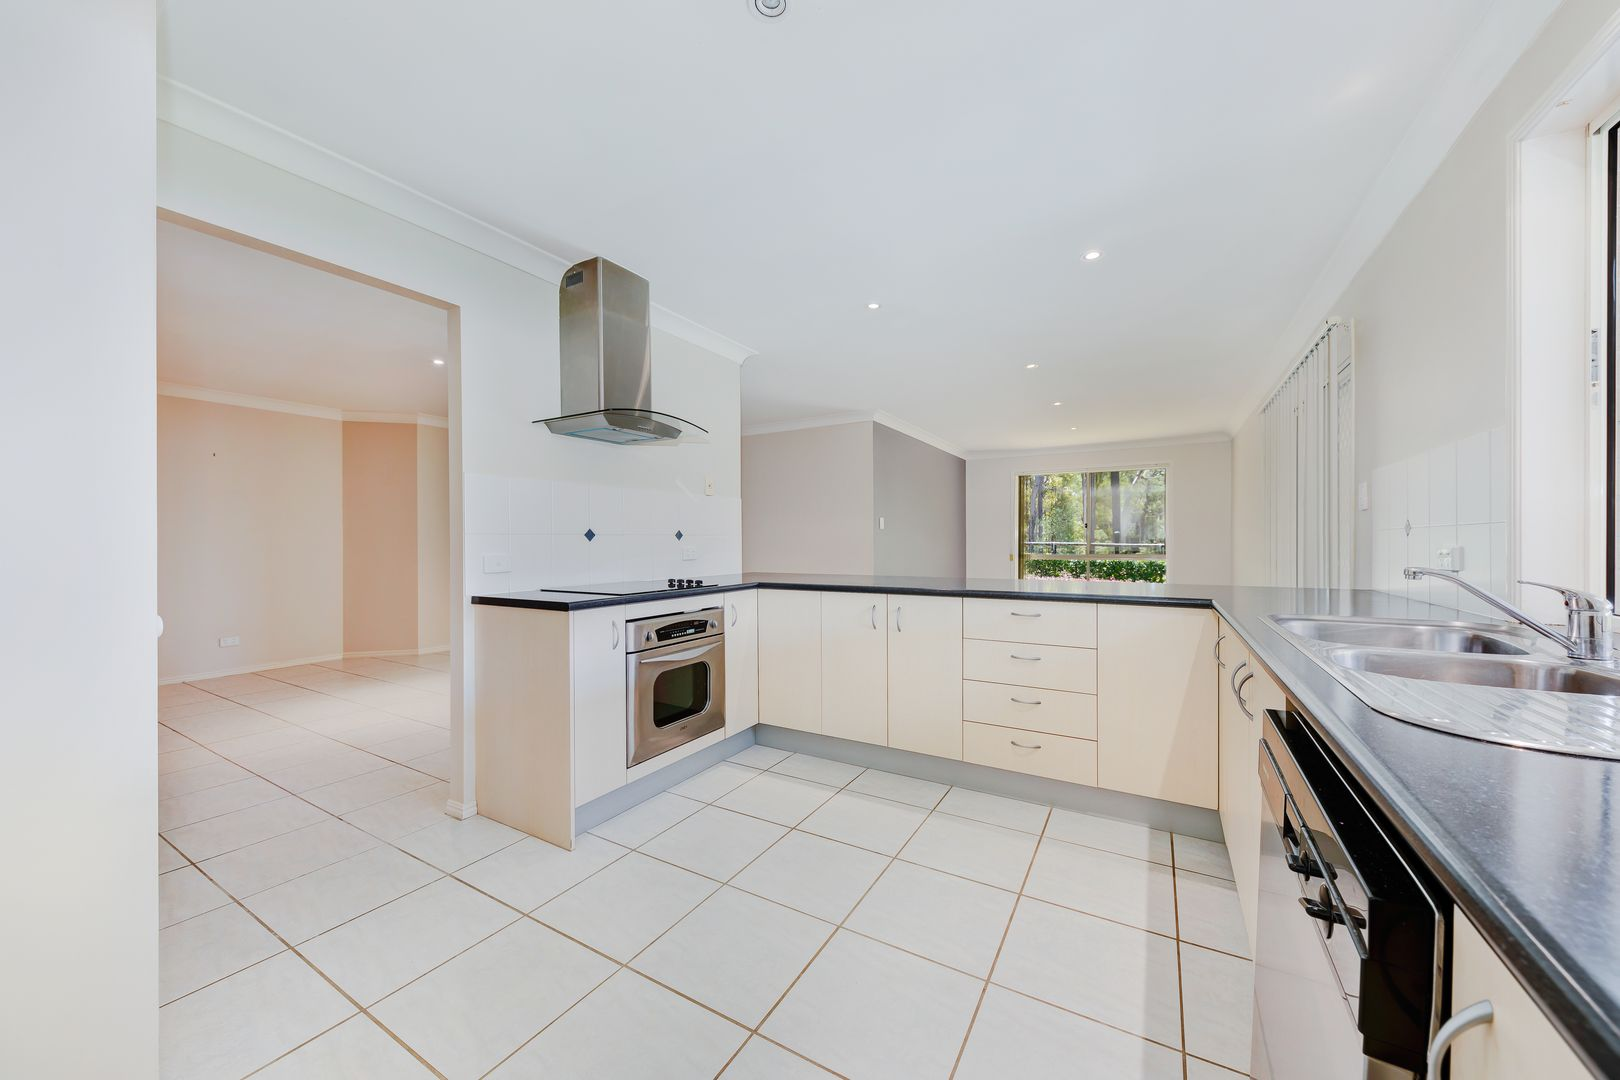 17 Tiverton Place, Landsborough QLD 4550, Image 2